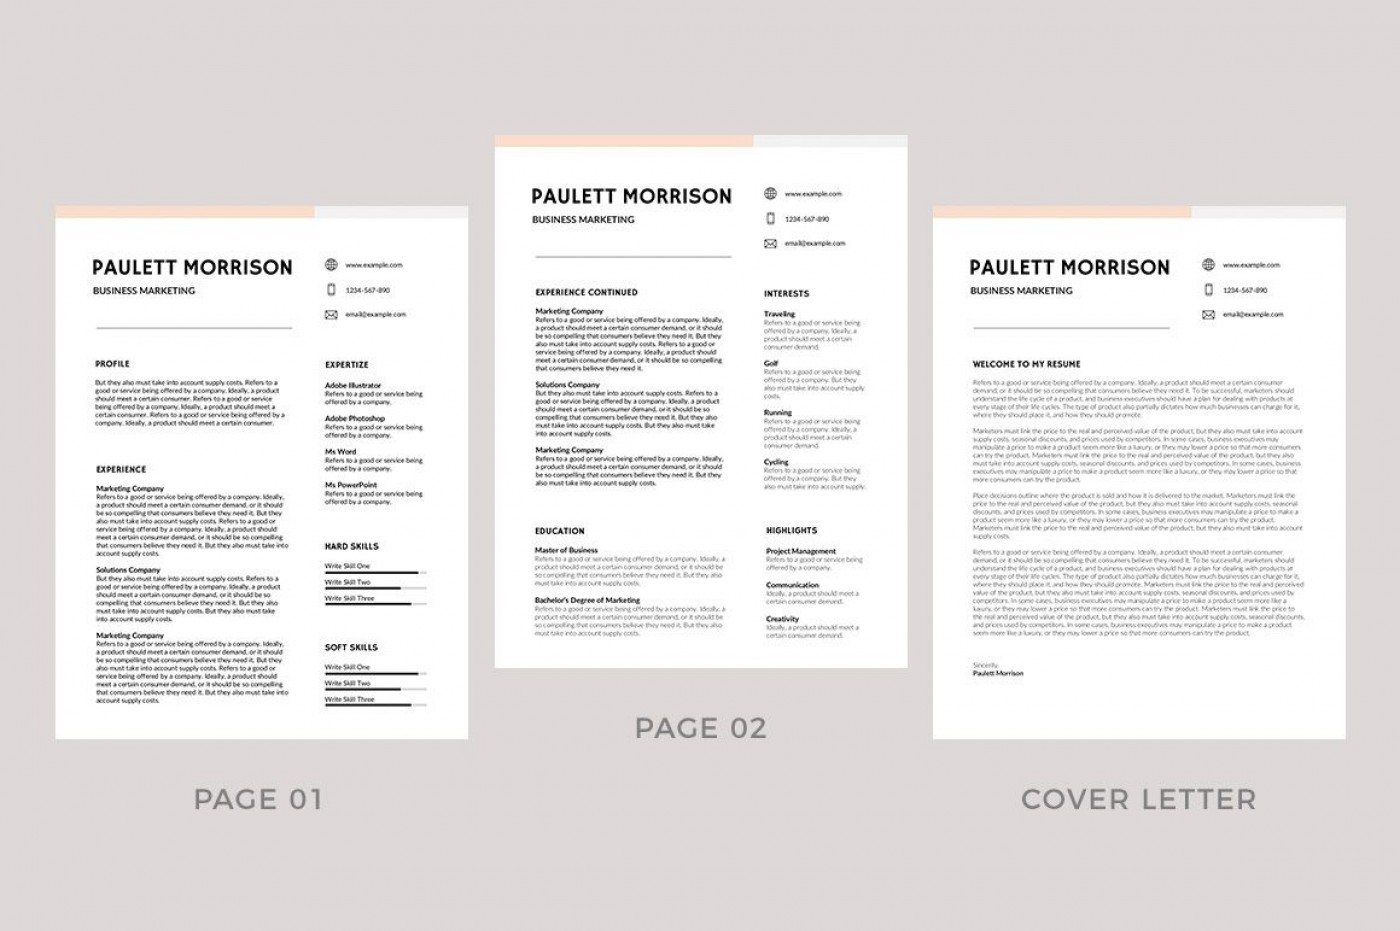 009 Sensational Download Resume Template Free Sample  For Mac Best Creative Professional Microsoft Word1400